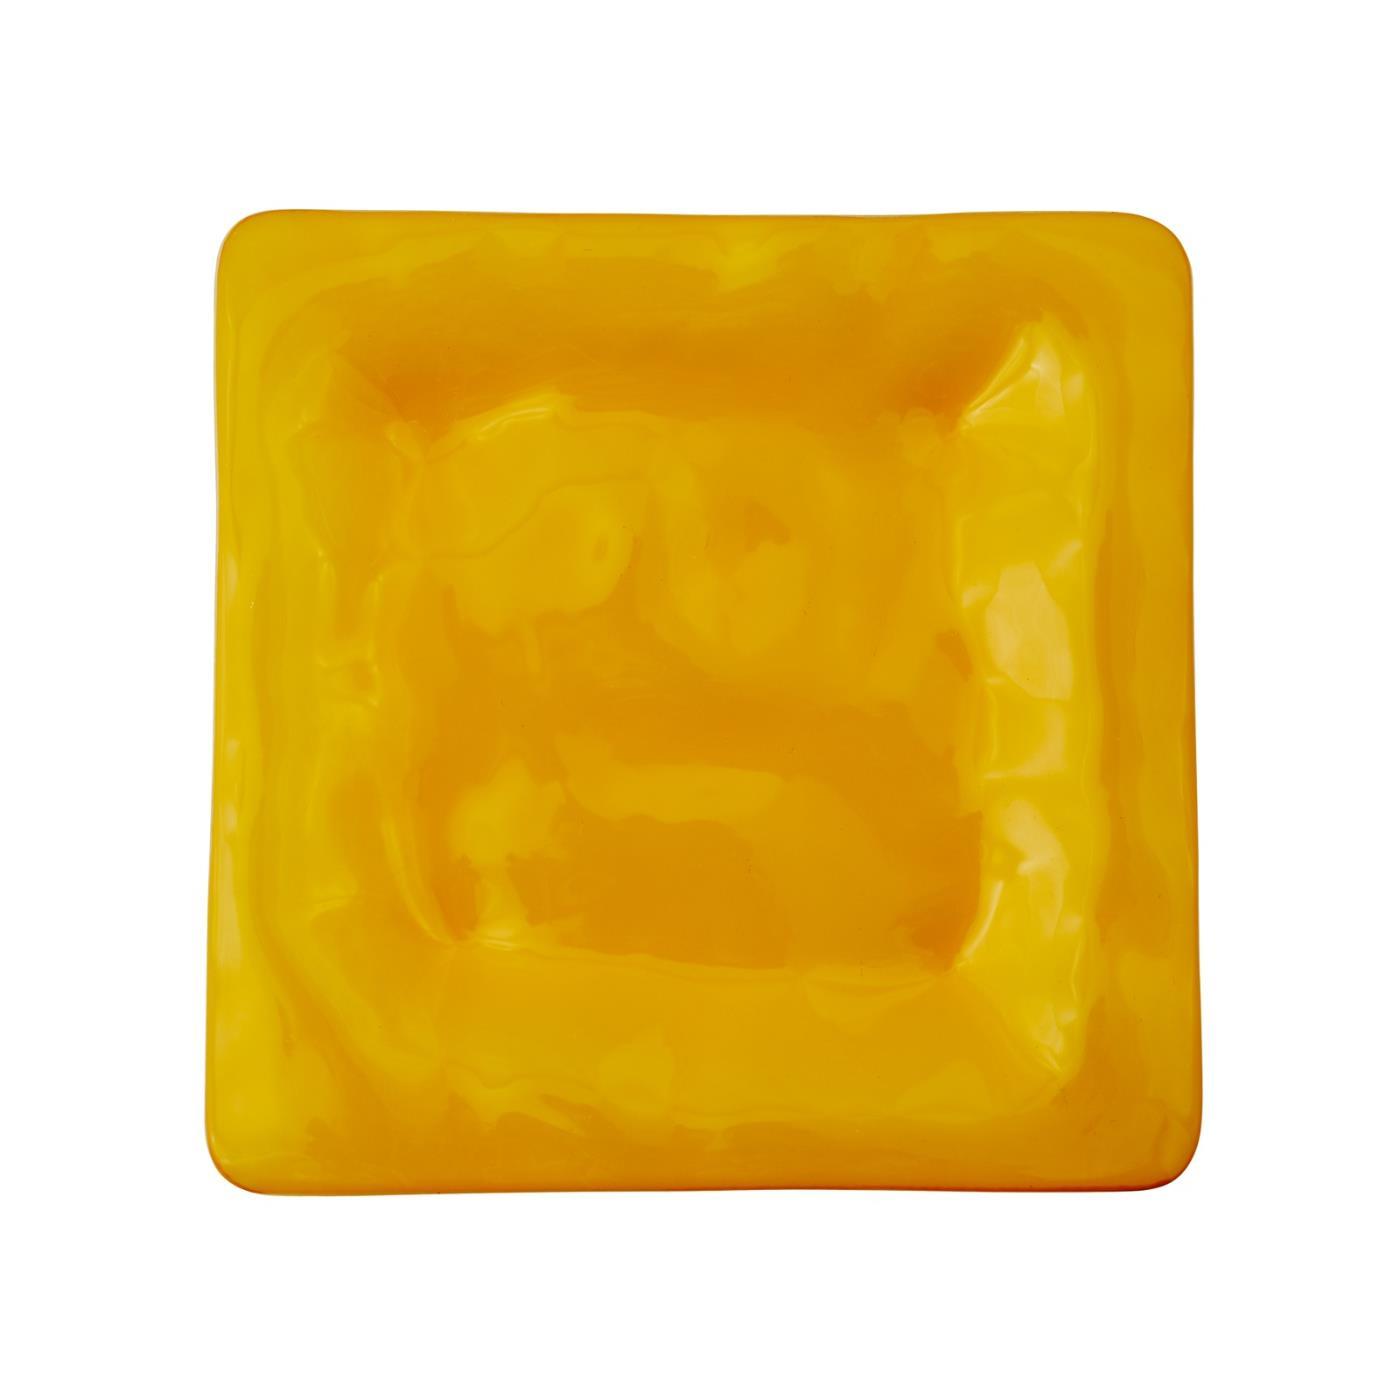 "Isla Glass Square Plate 8.5"" - Citrine"